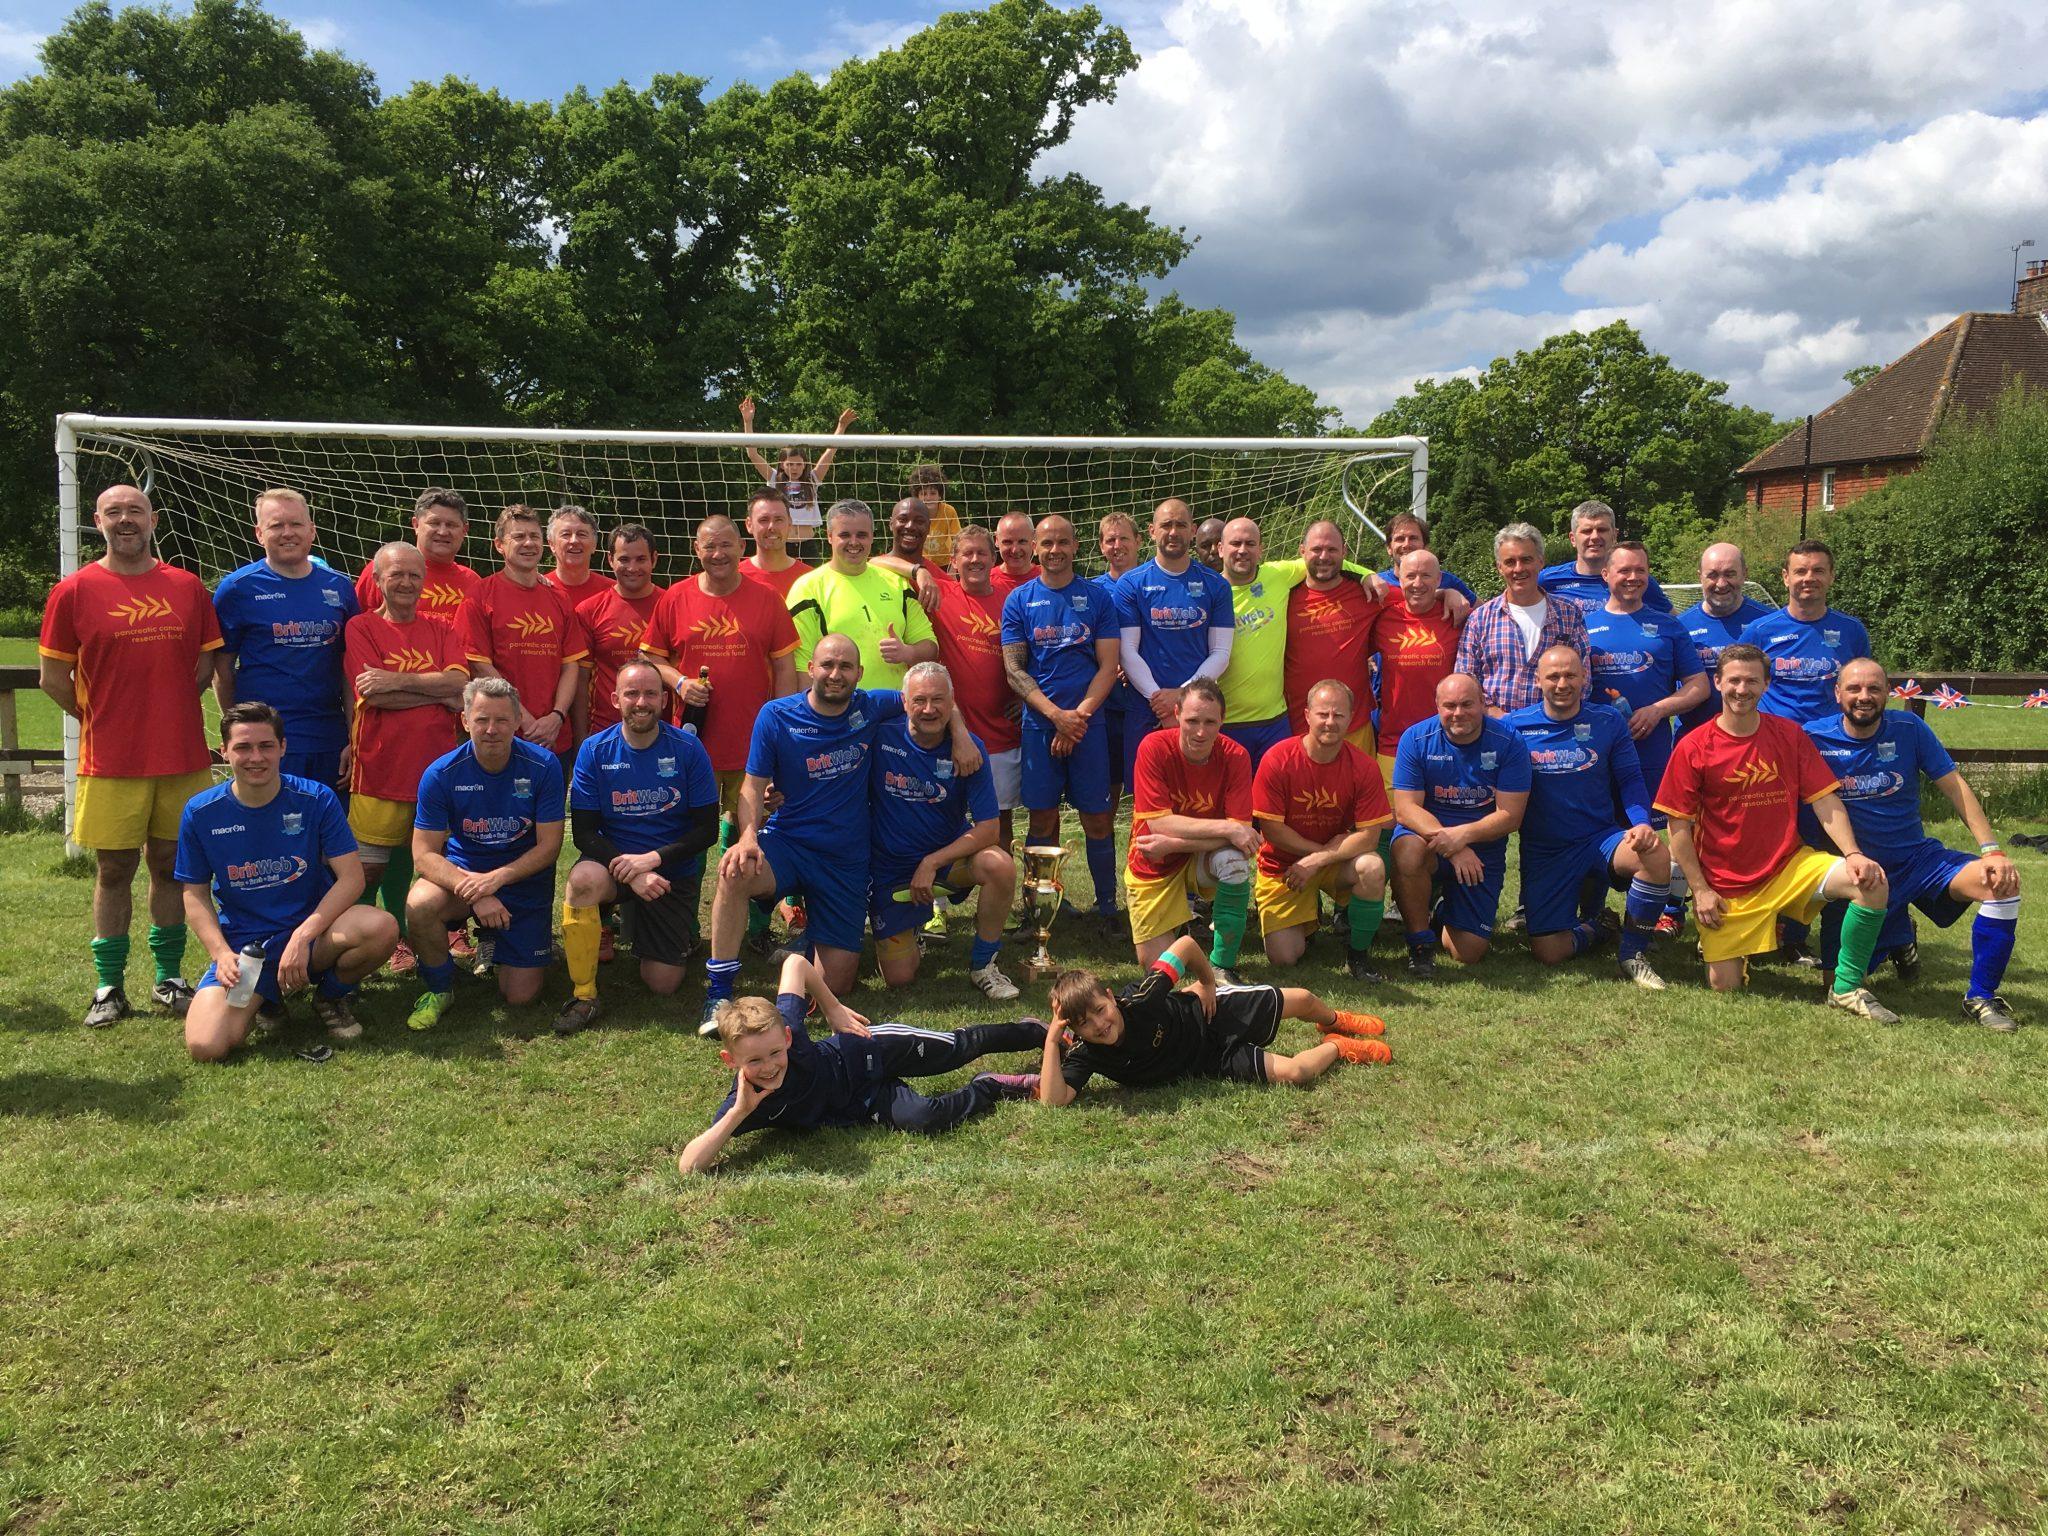 vets charity match 2018